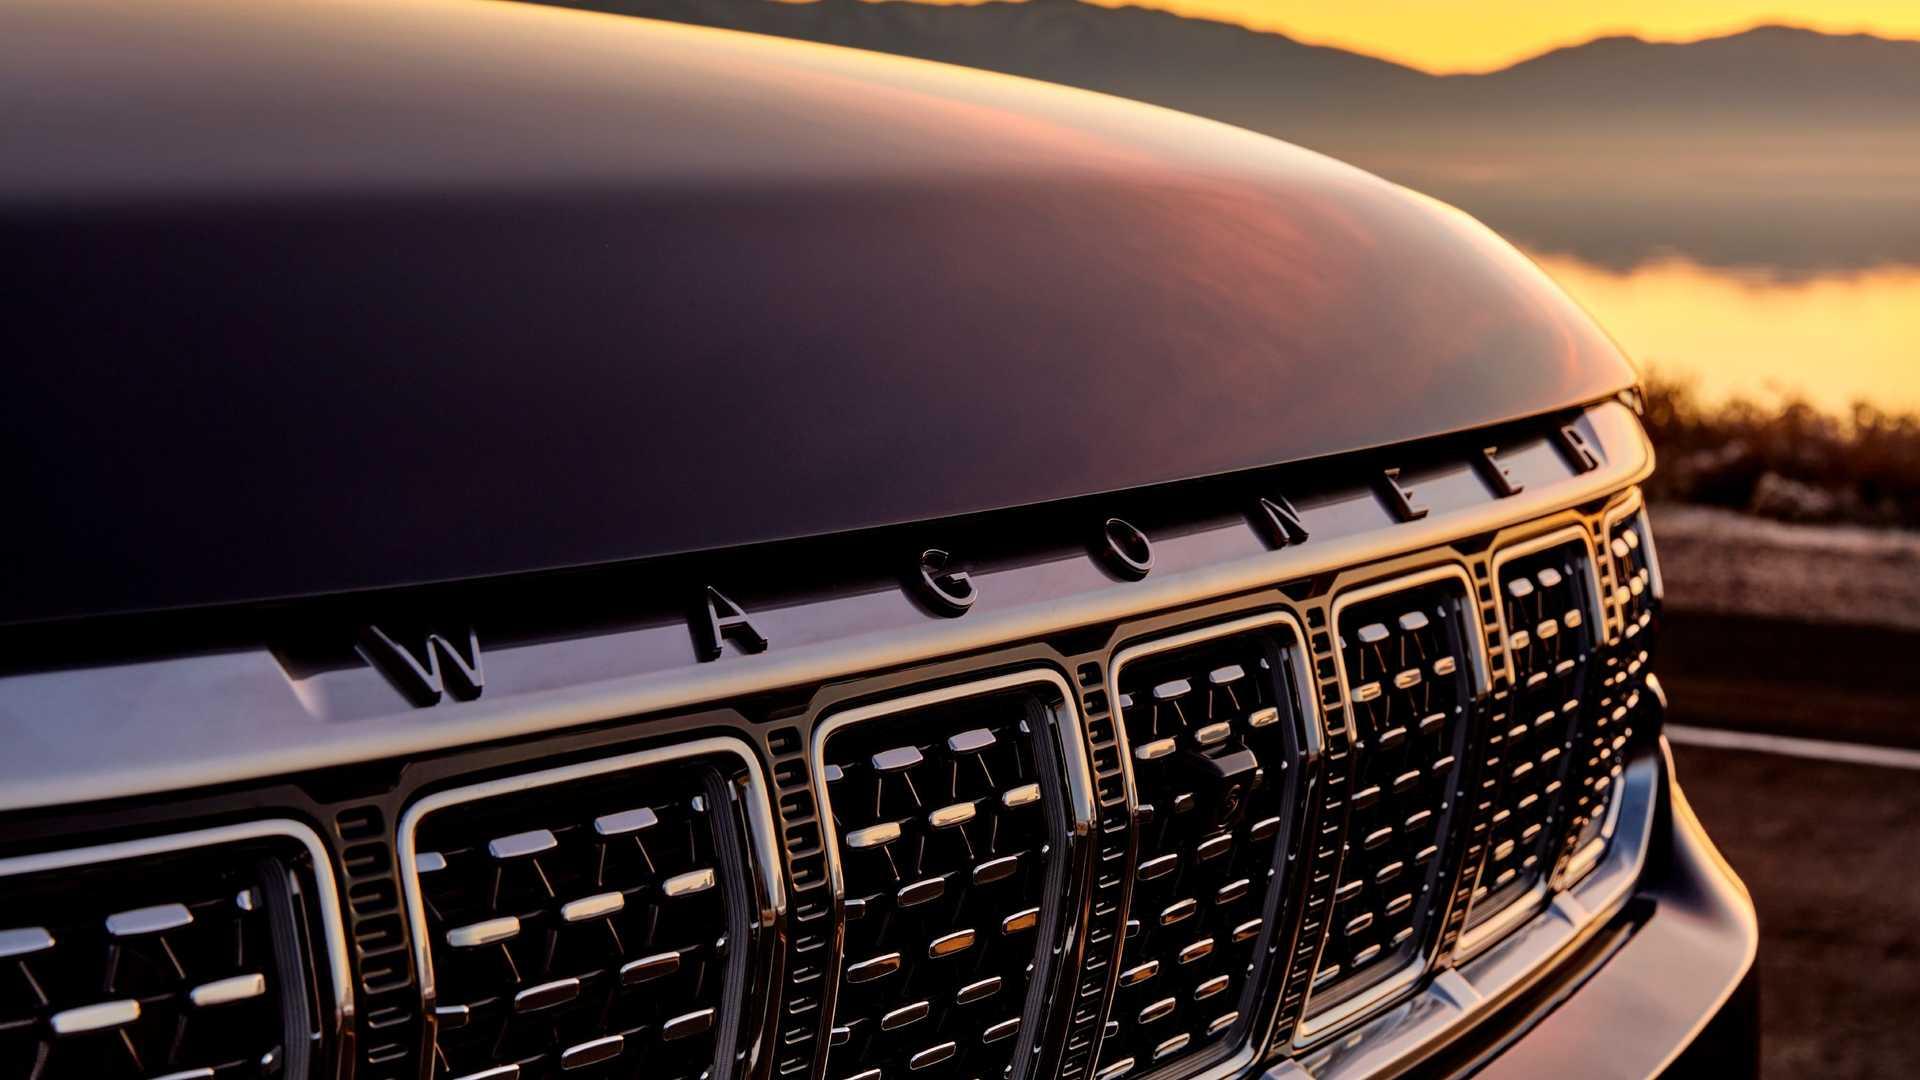 2022-jeep-grand-wagoneer-exterior-badging-2